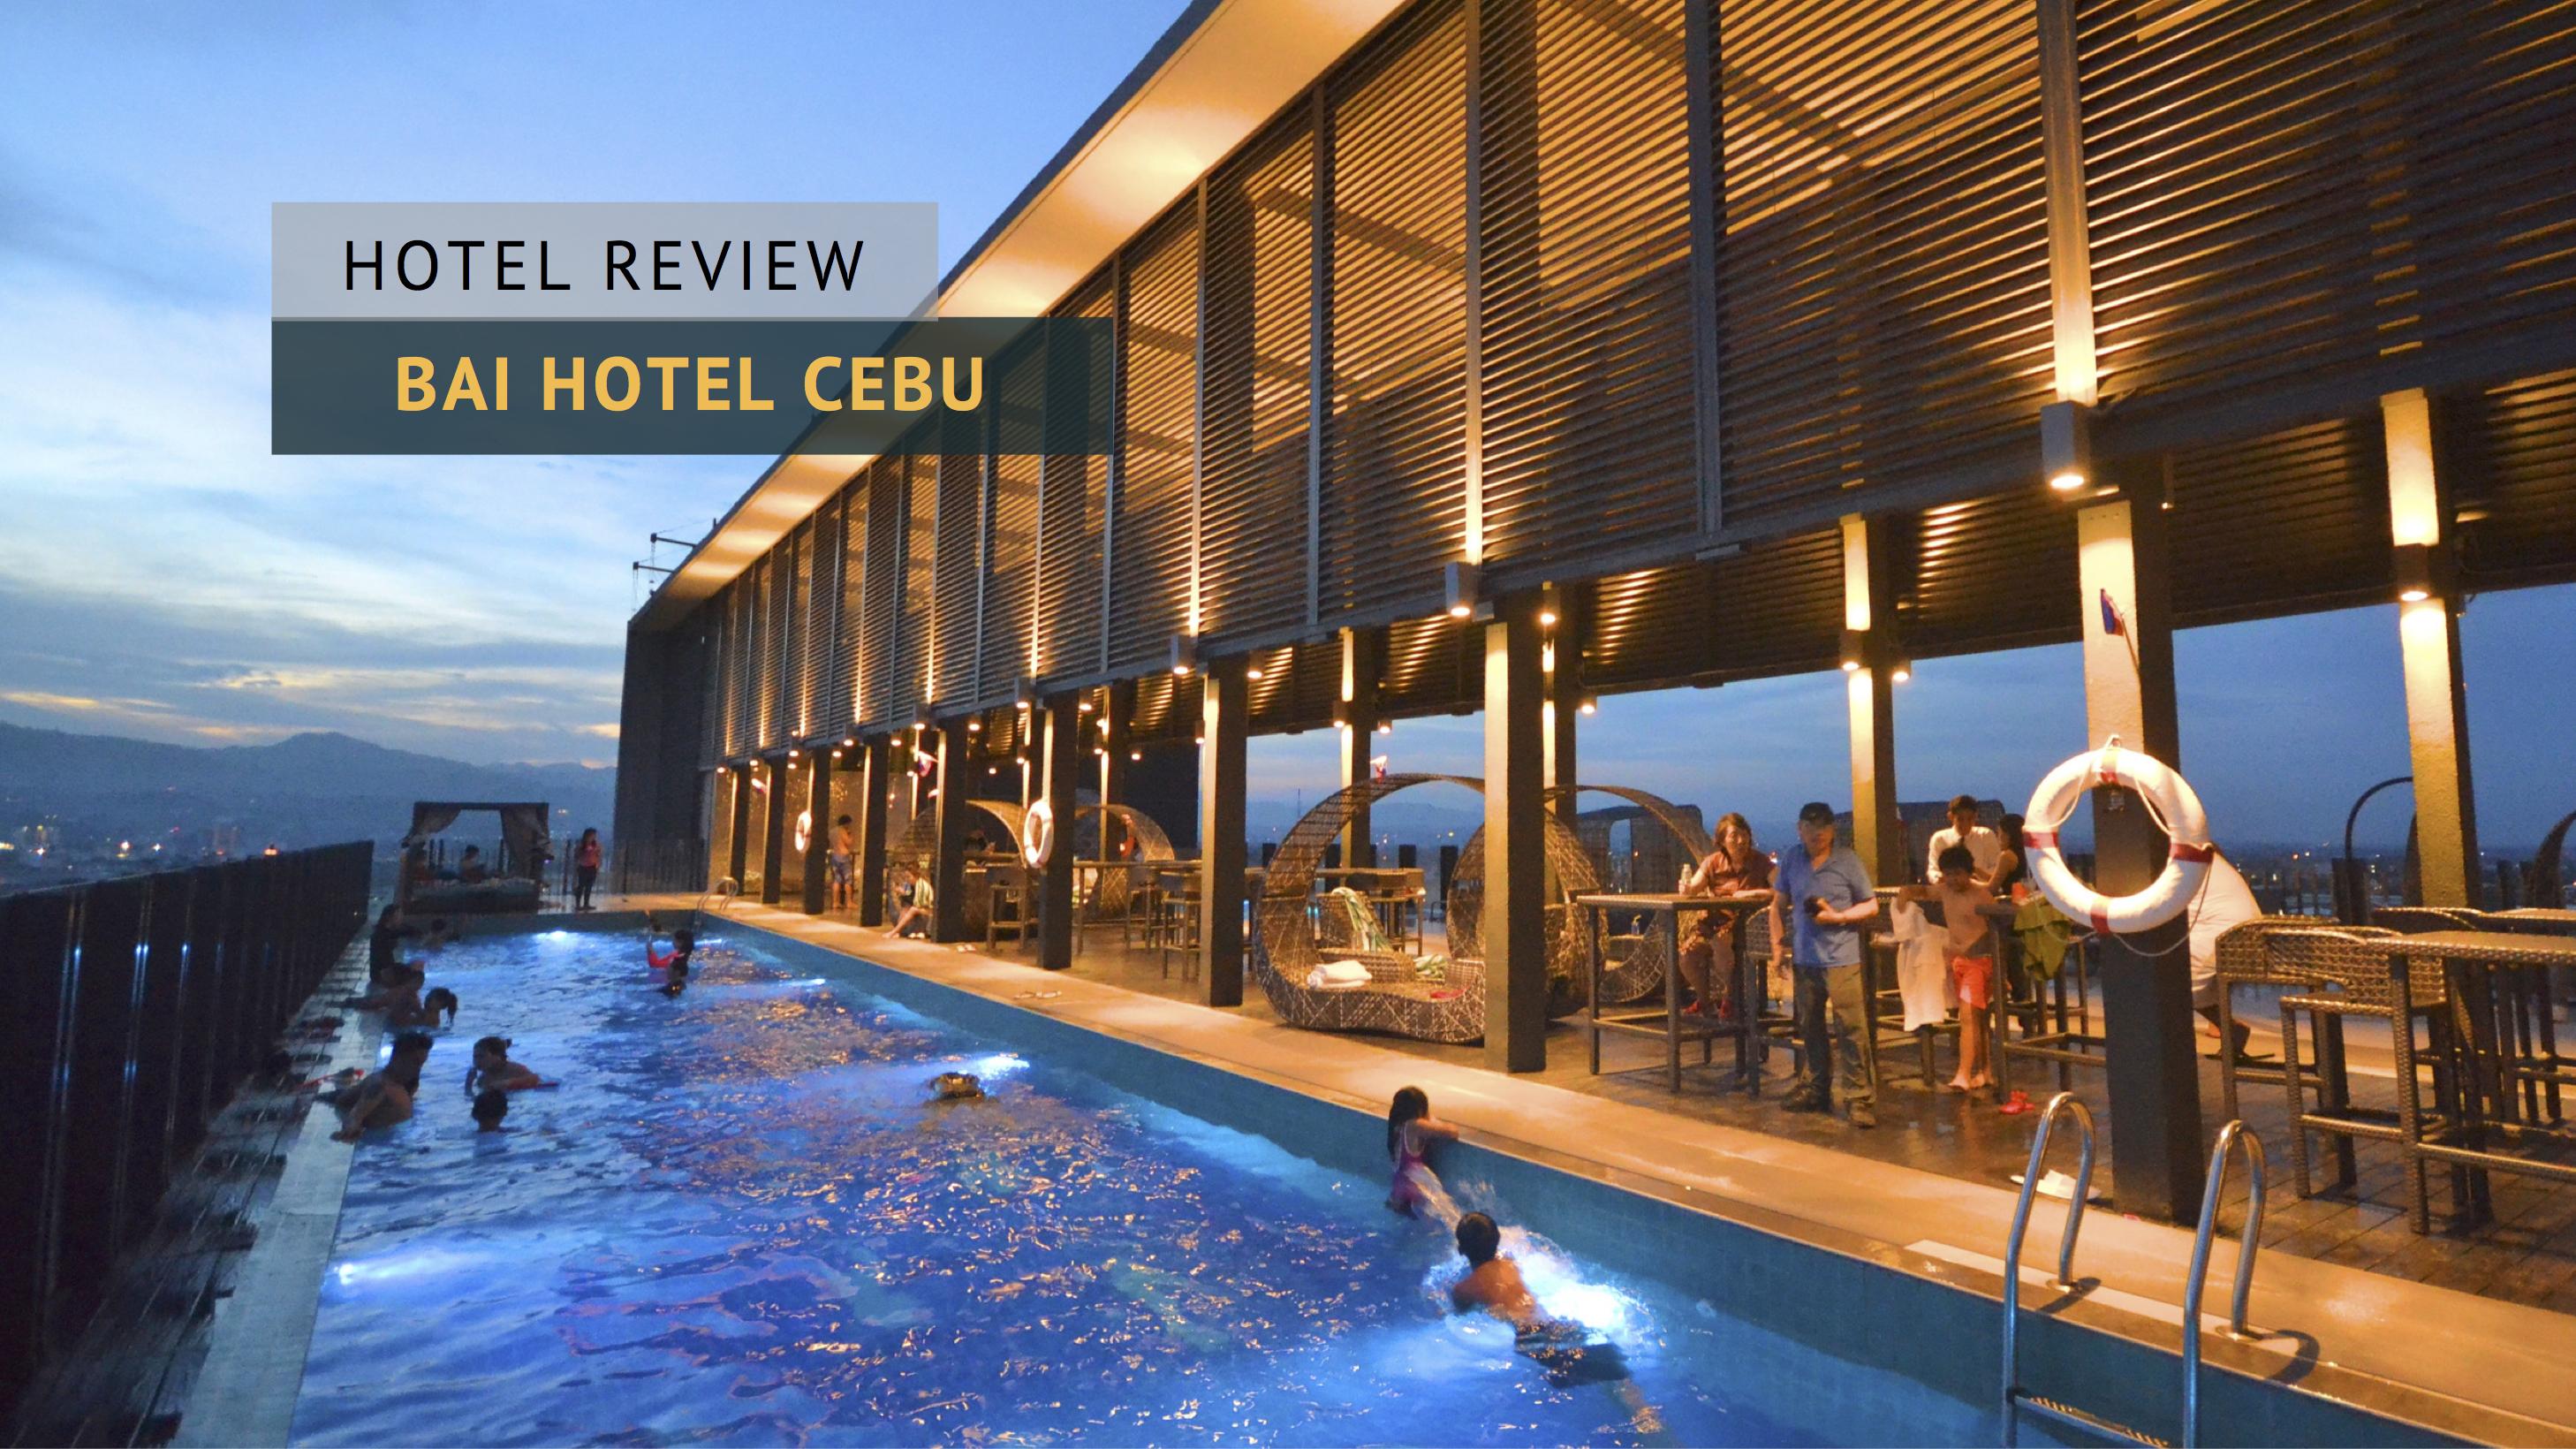 Bai Hotel Cebu: Stay in the Heart of Metro Cebu - iWander